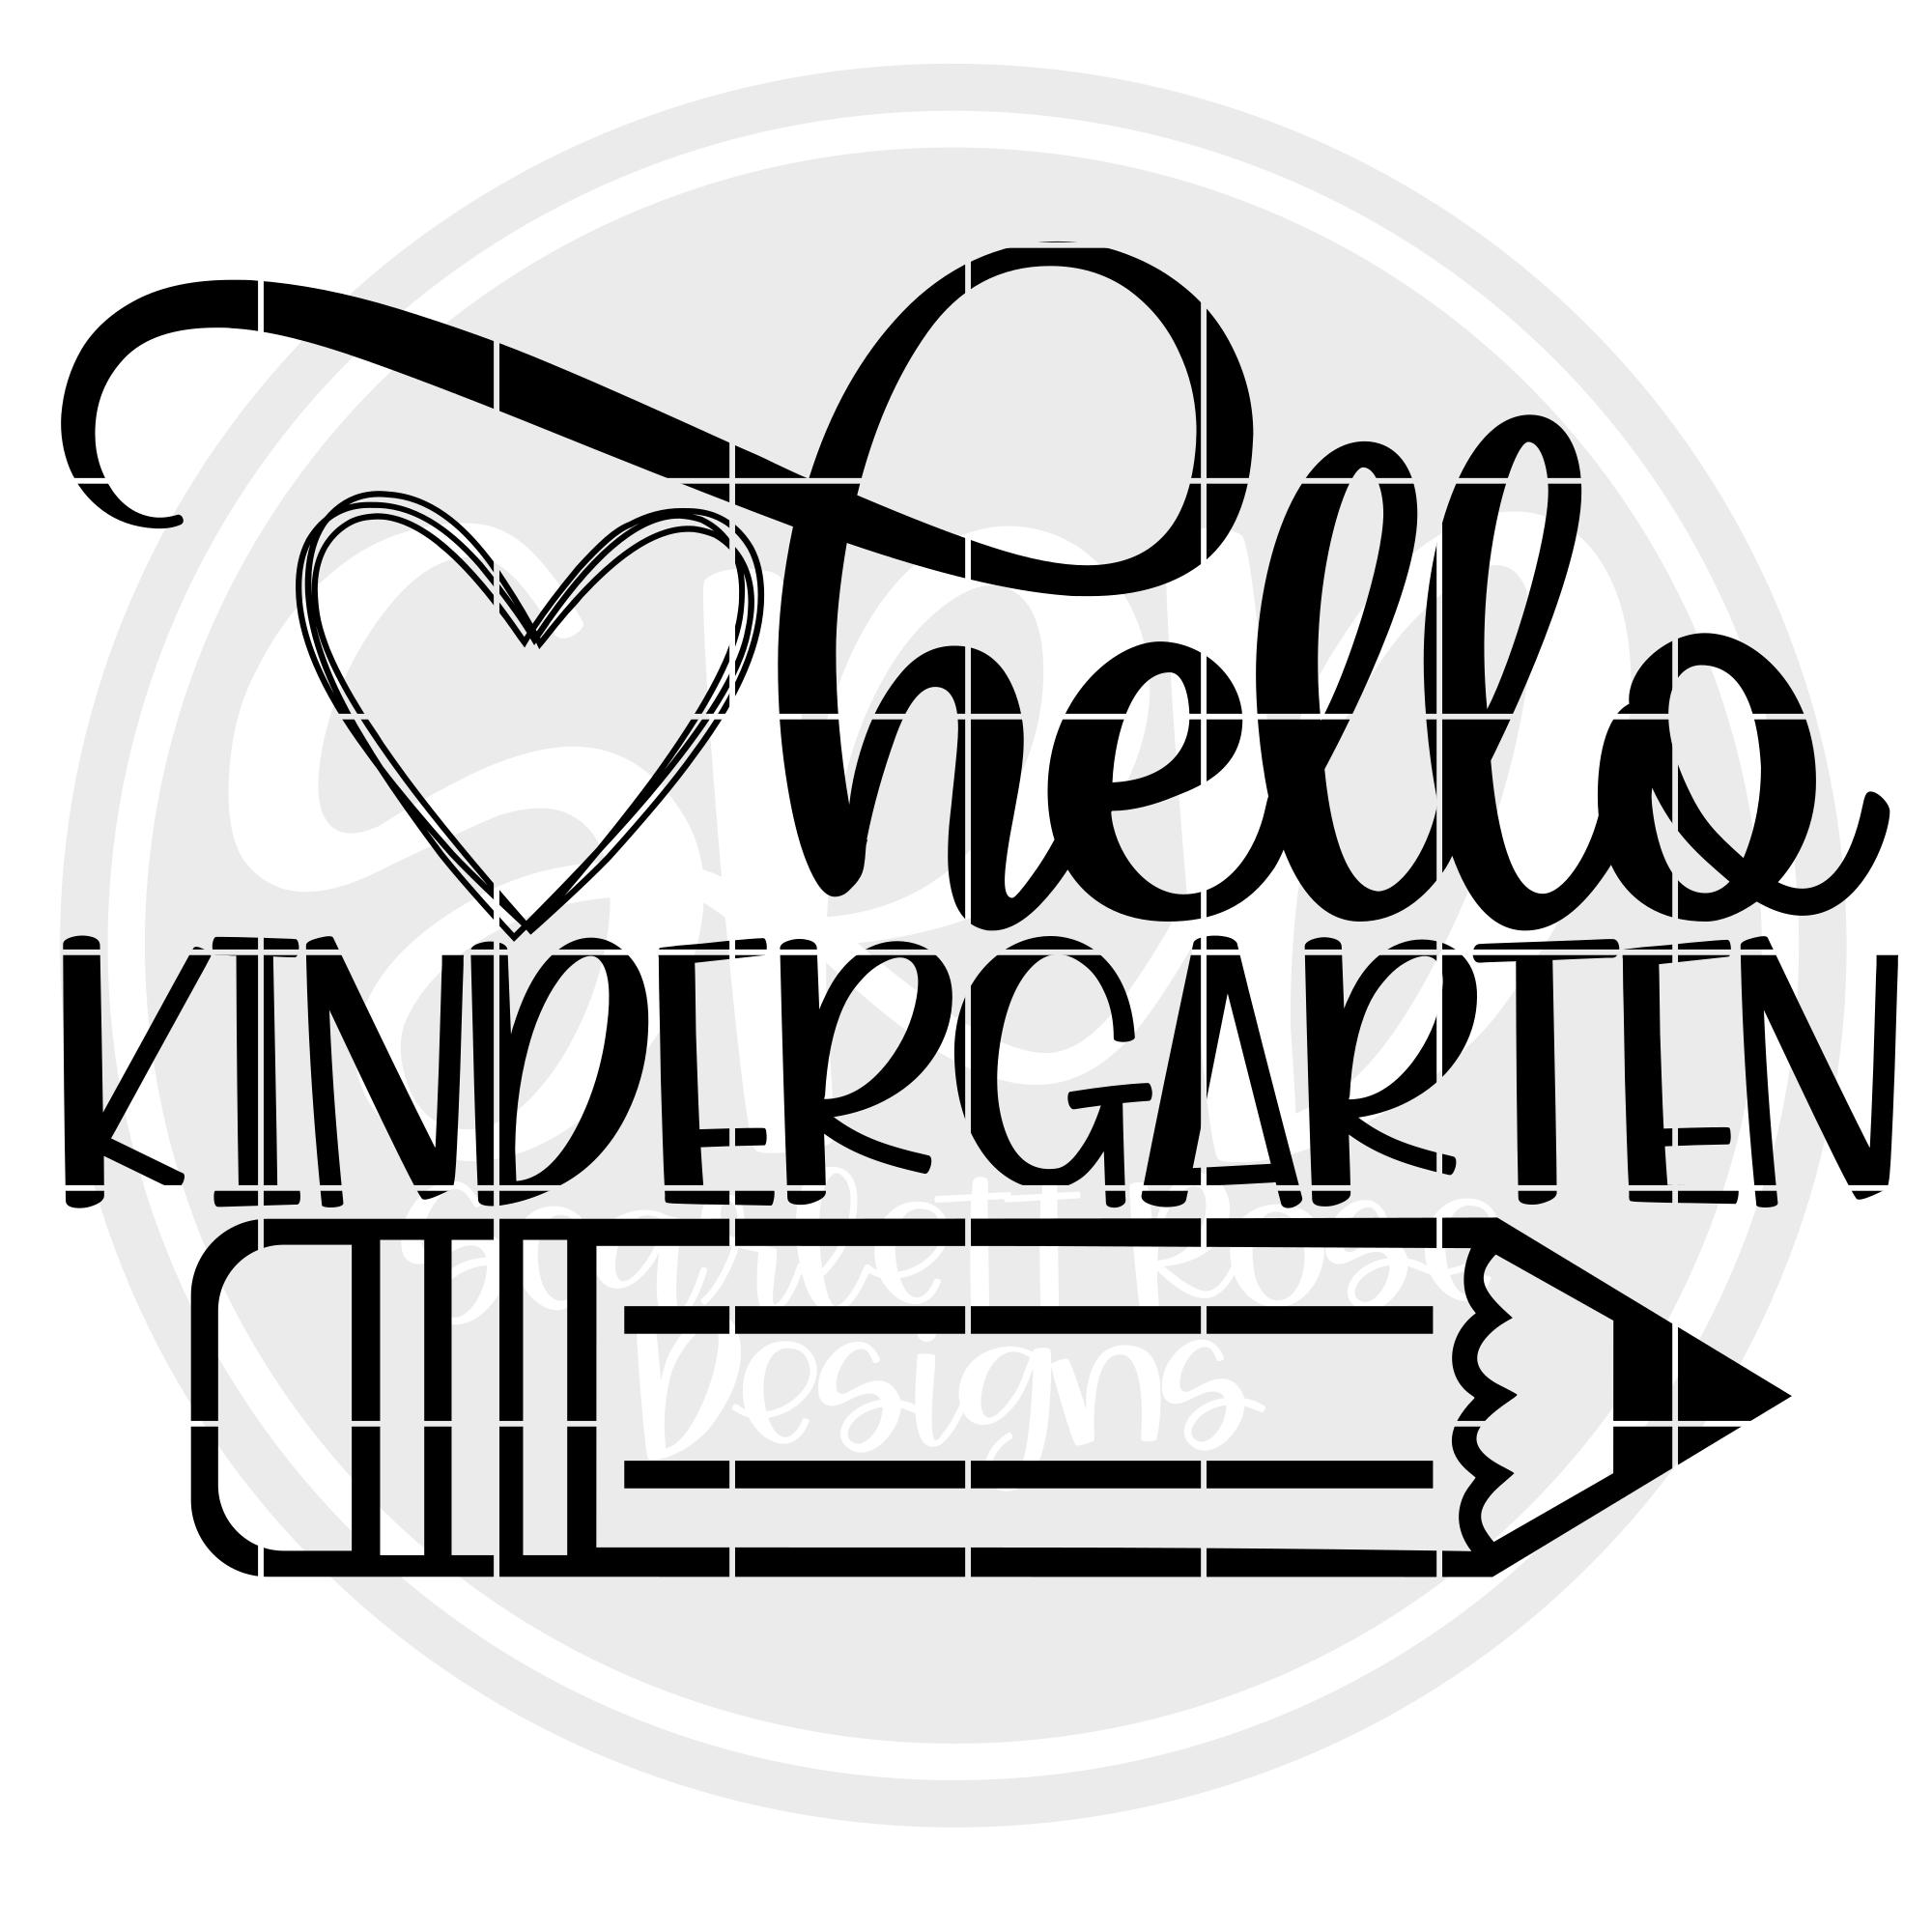 kindergarten svg #1227, Download drawings